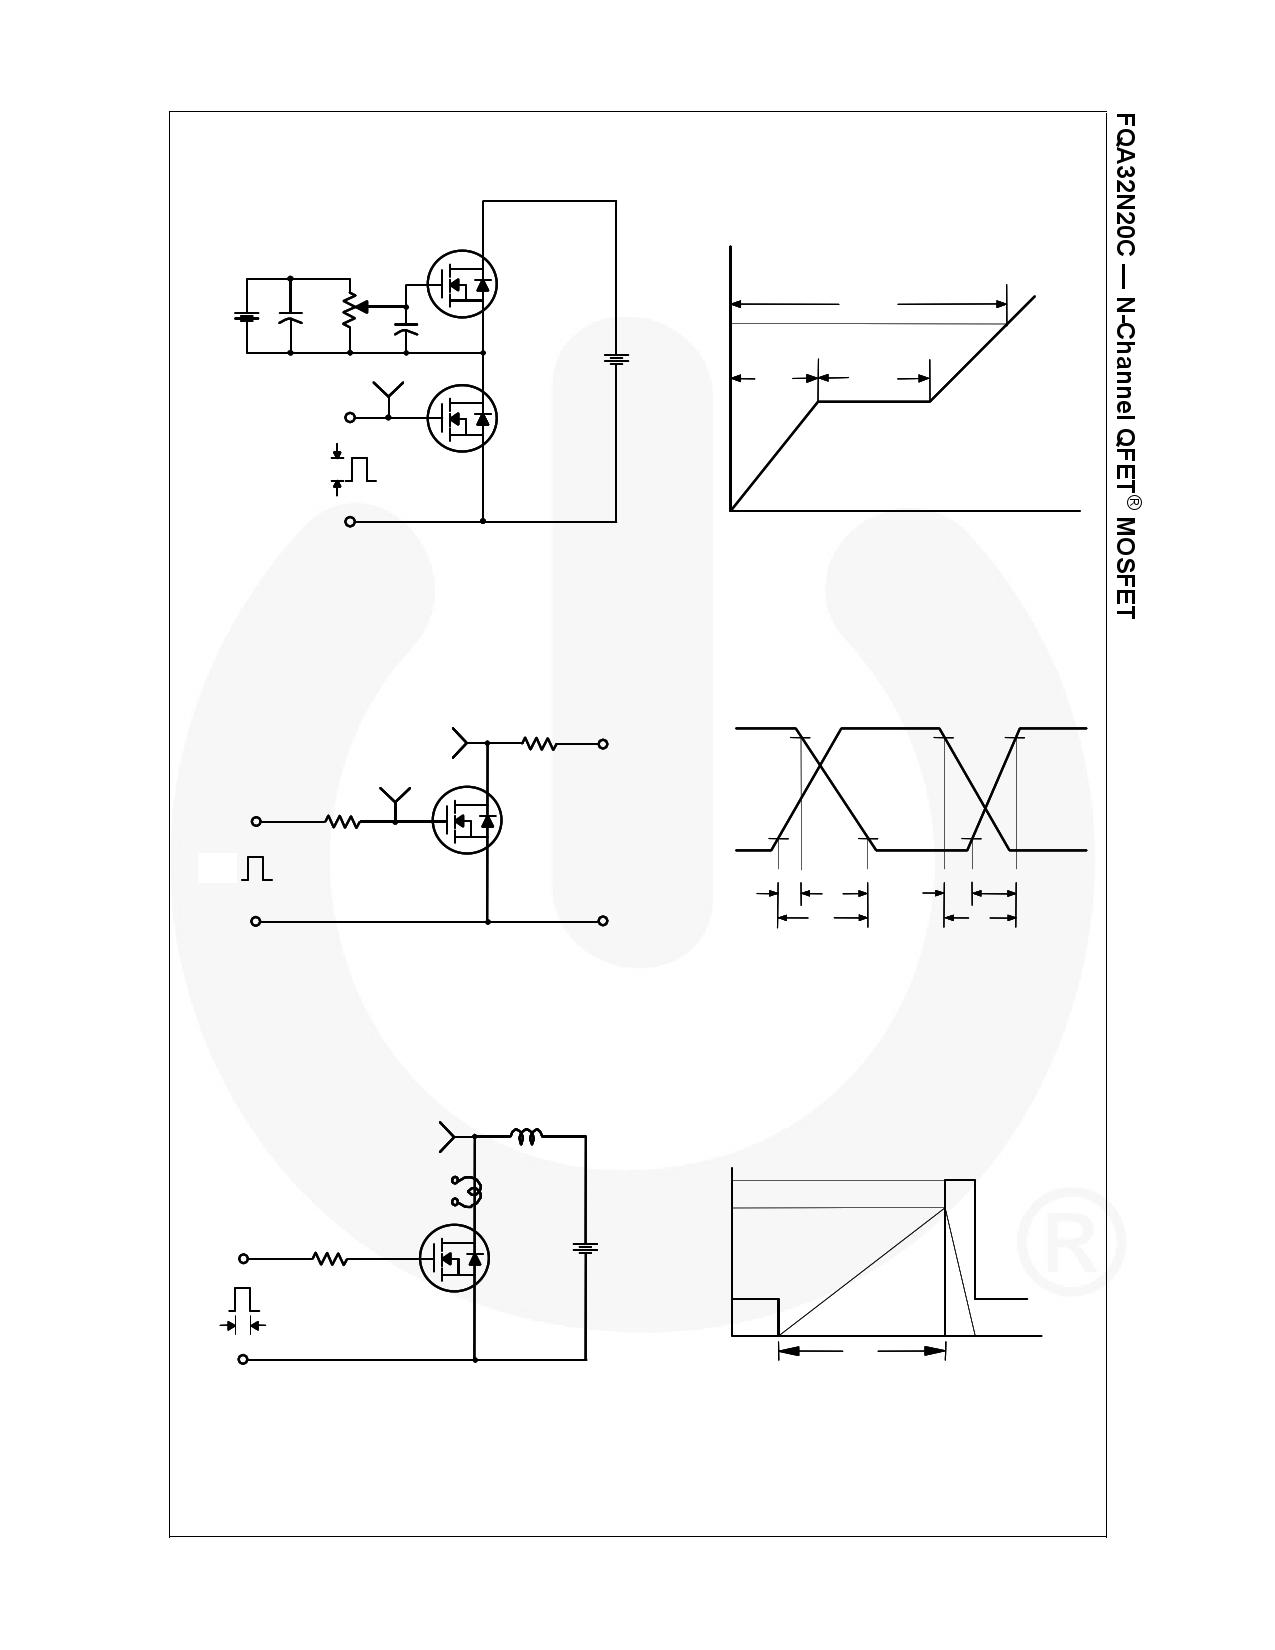 FQA32N20C equivalent